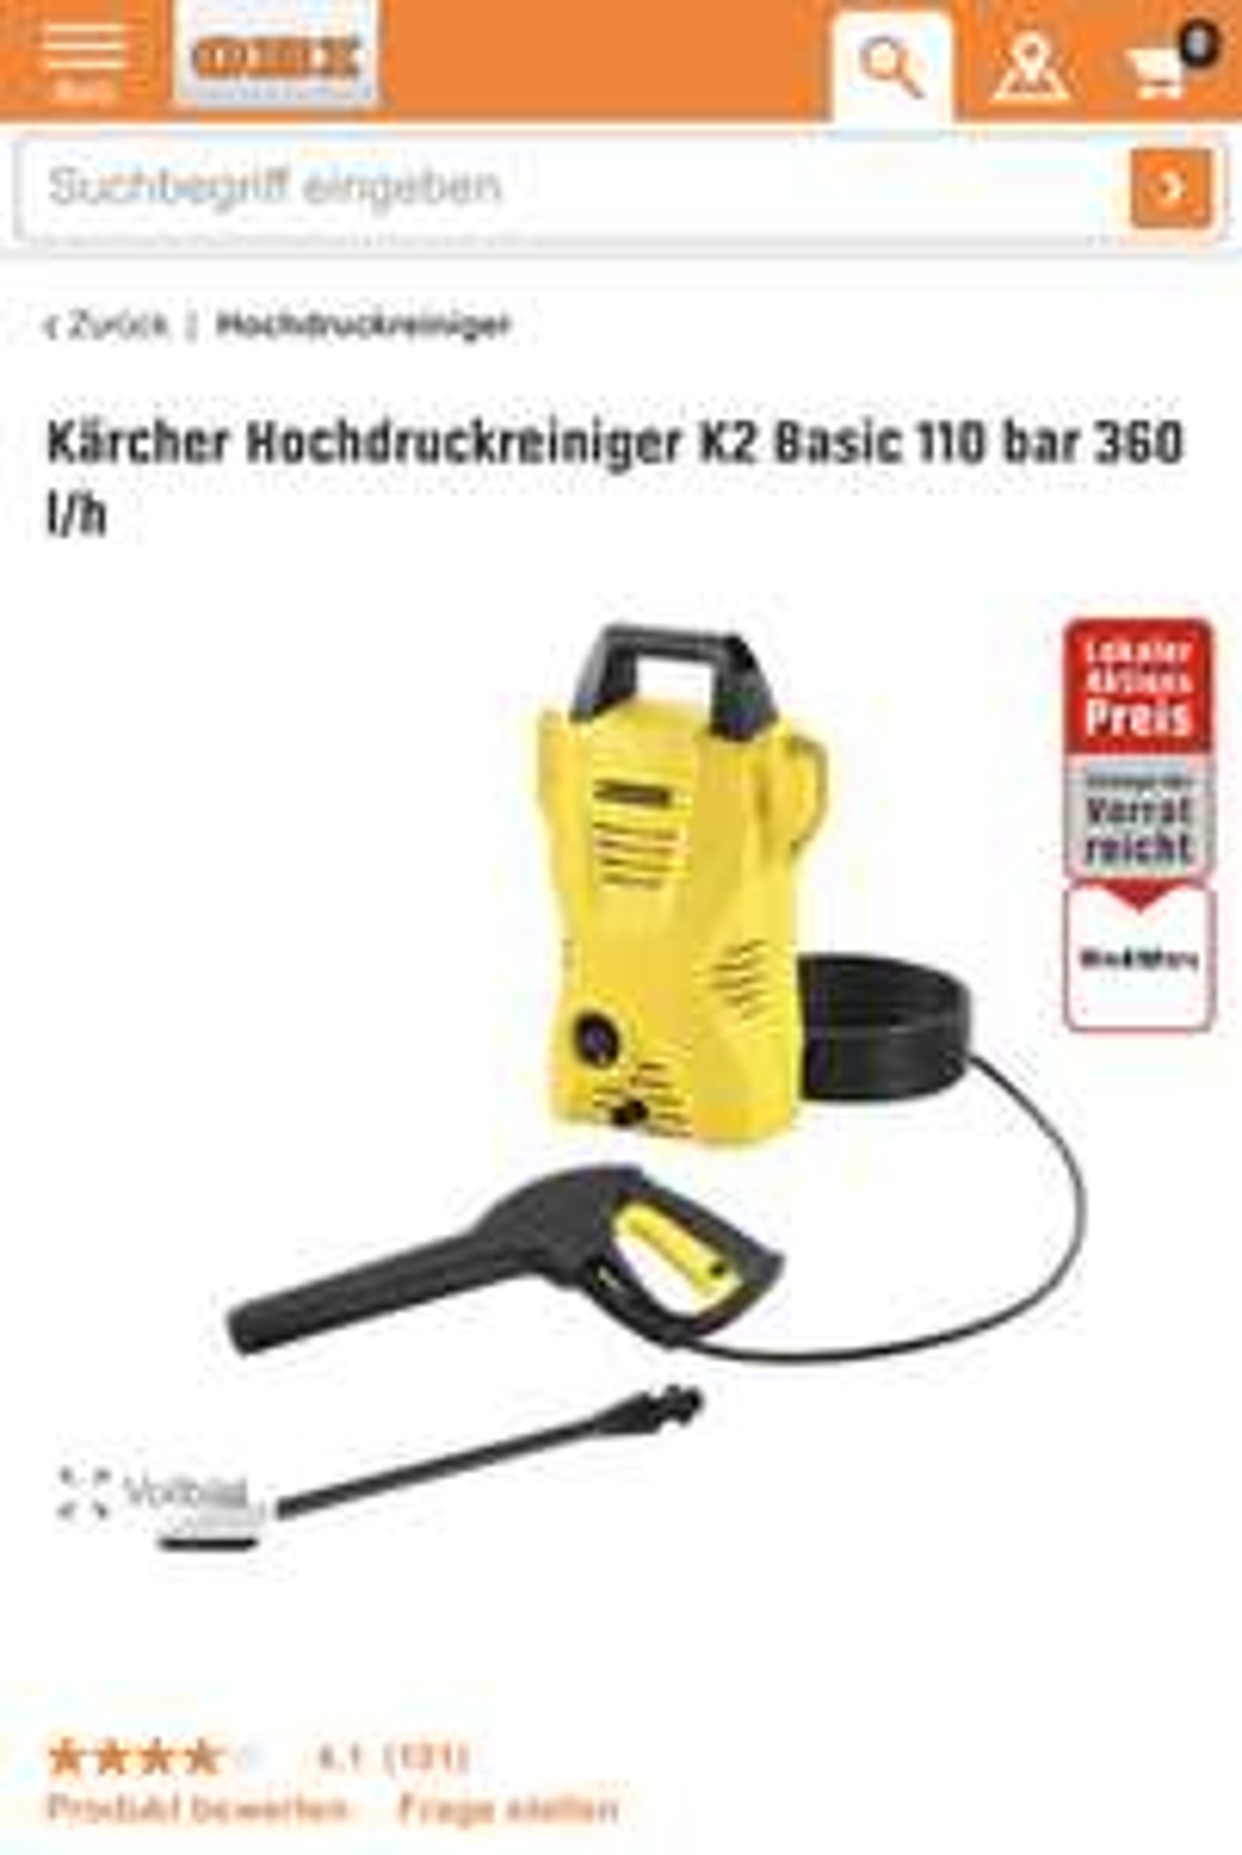 Kärcher Hochdruckreiniger K2 Basic (St. Marx)